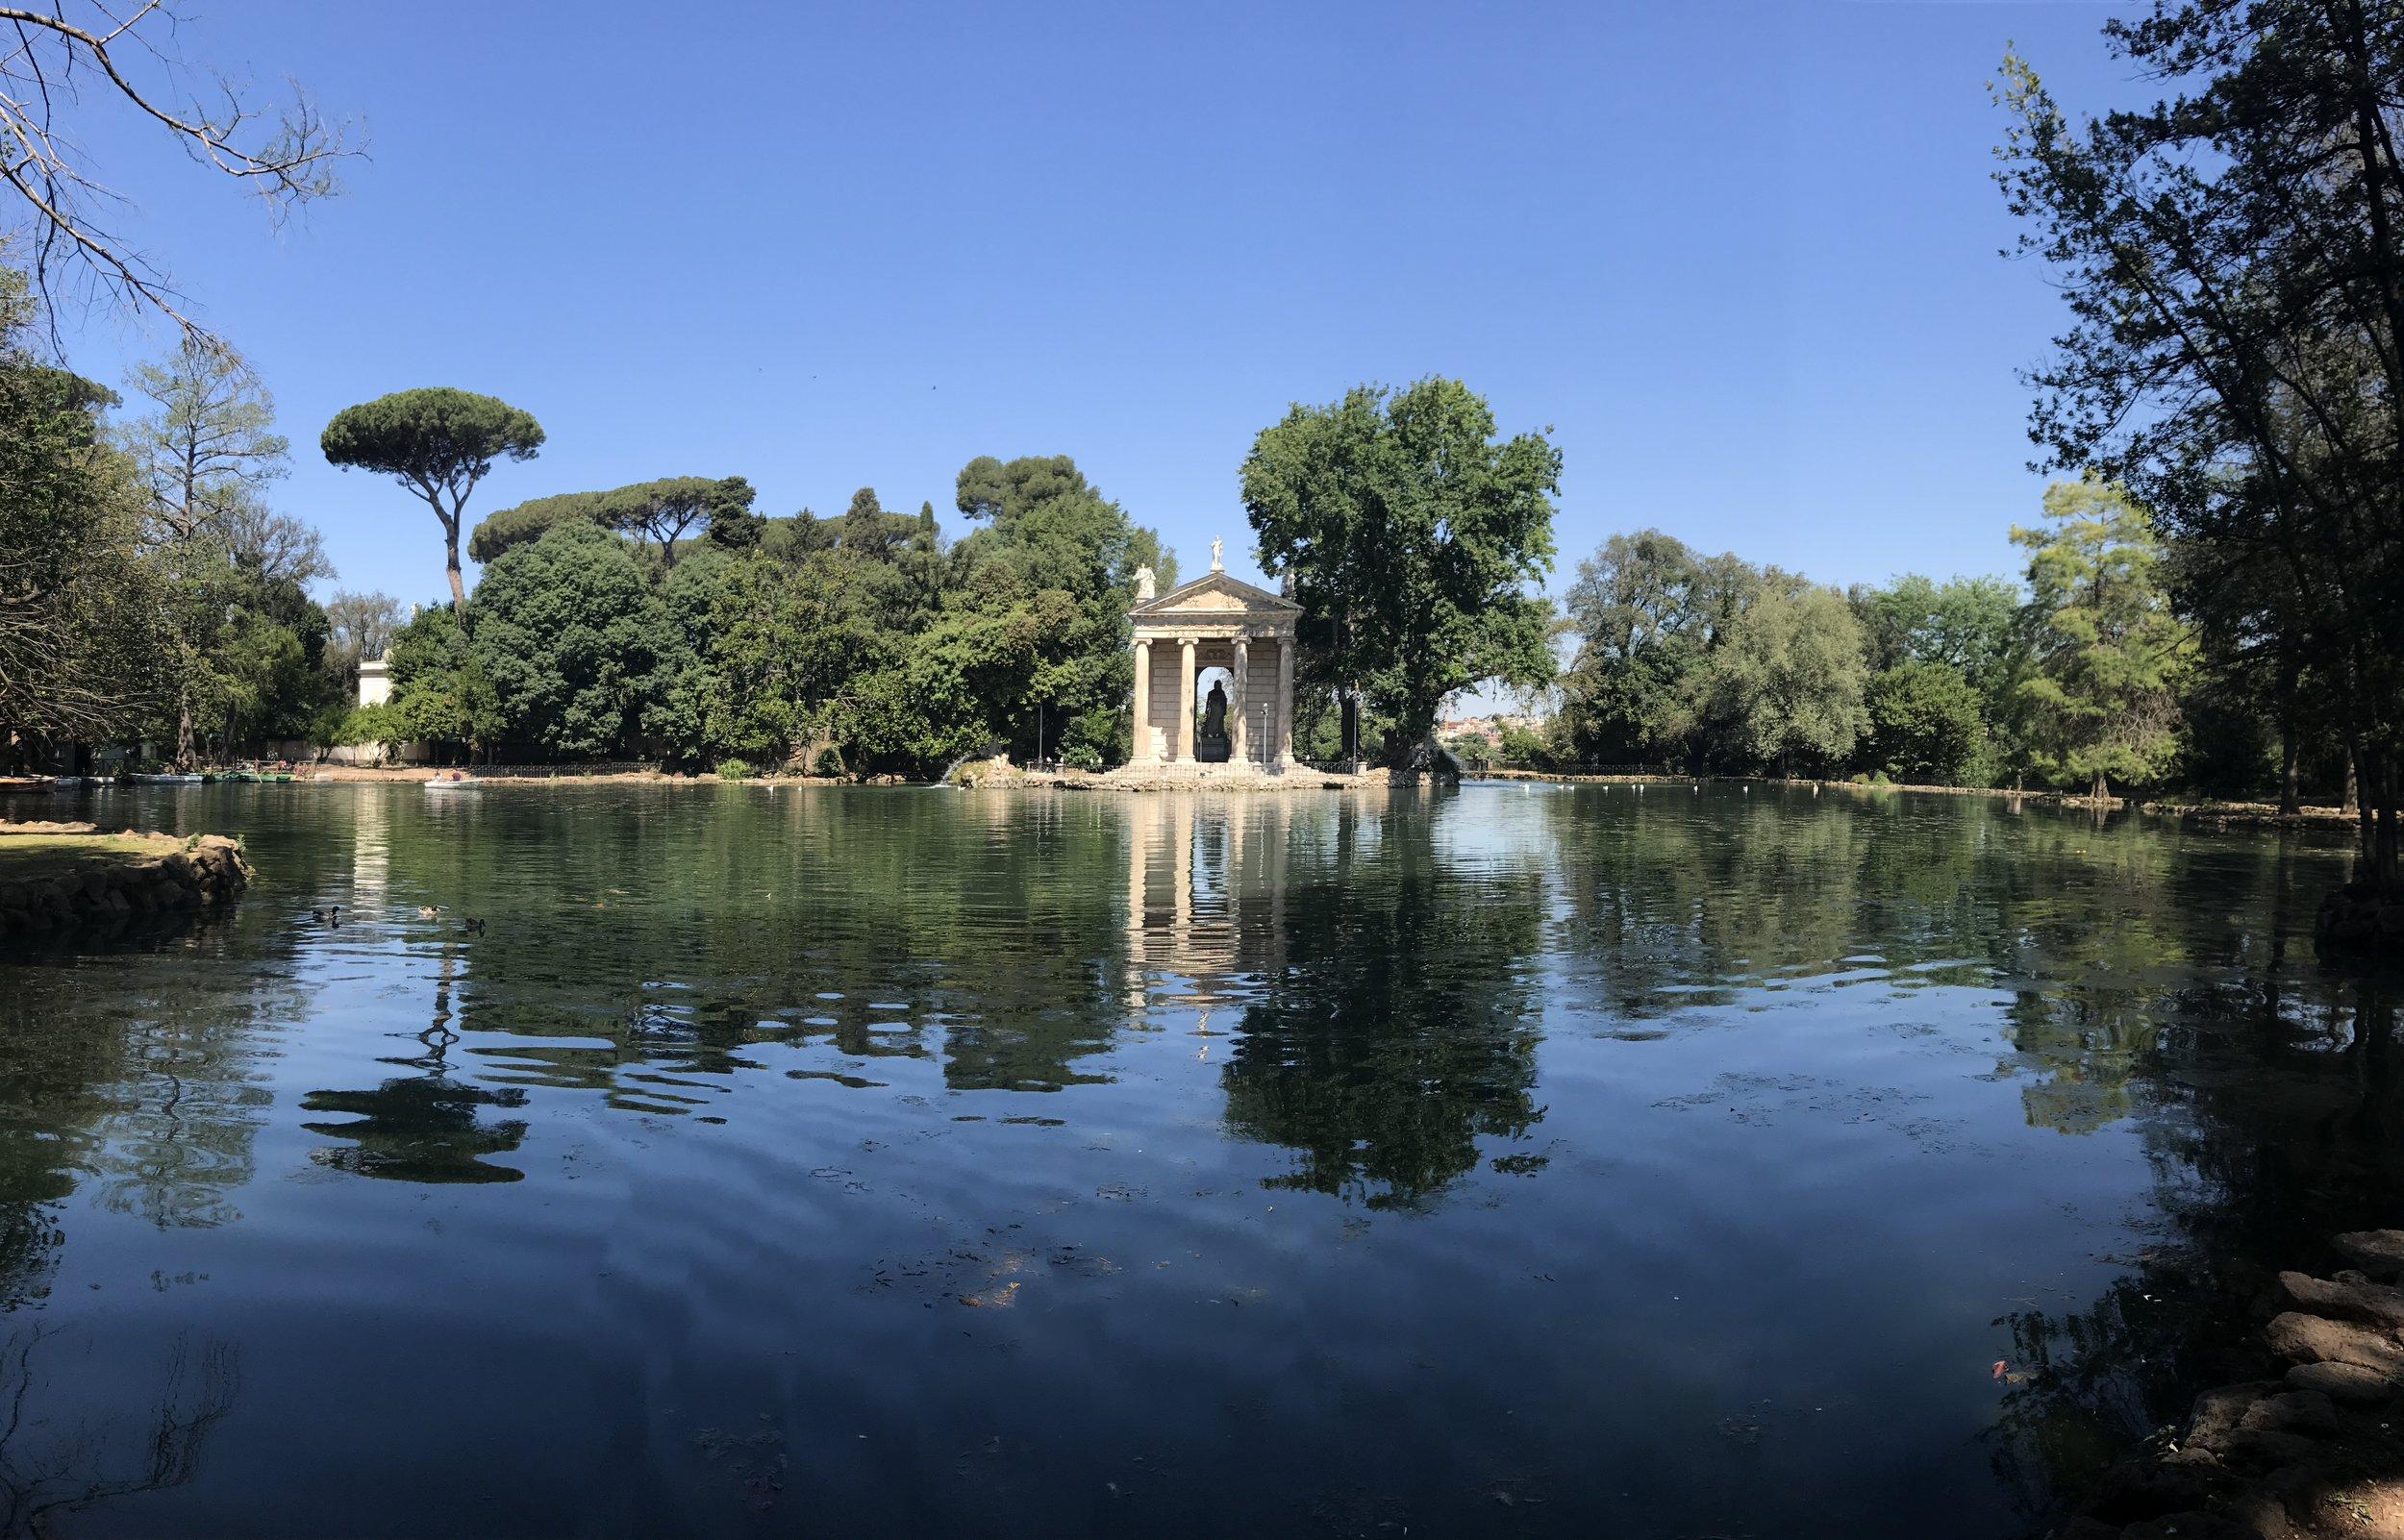 From Villa Borghese